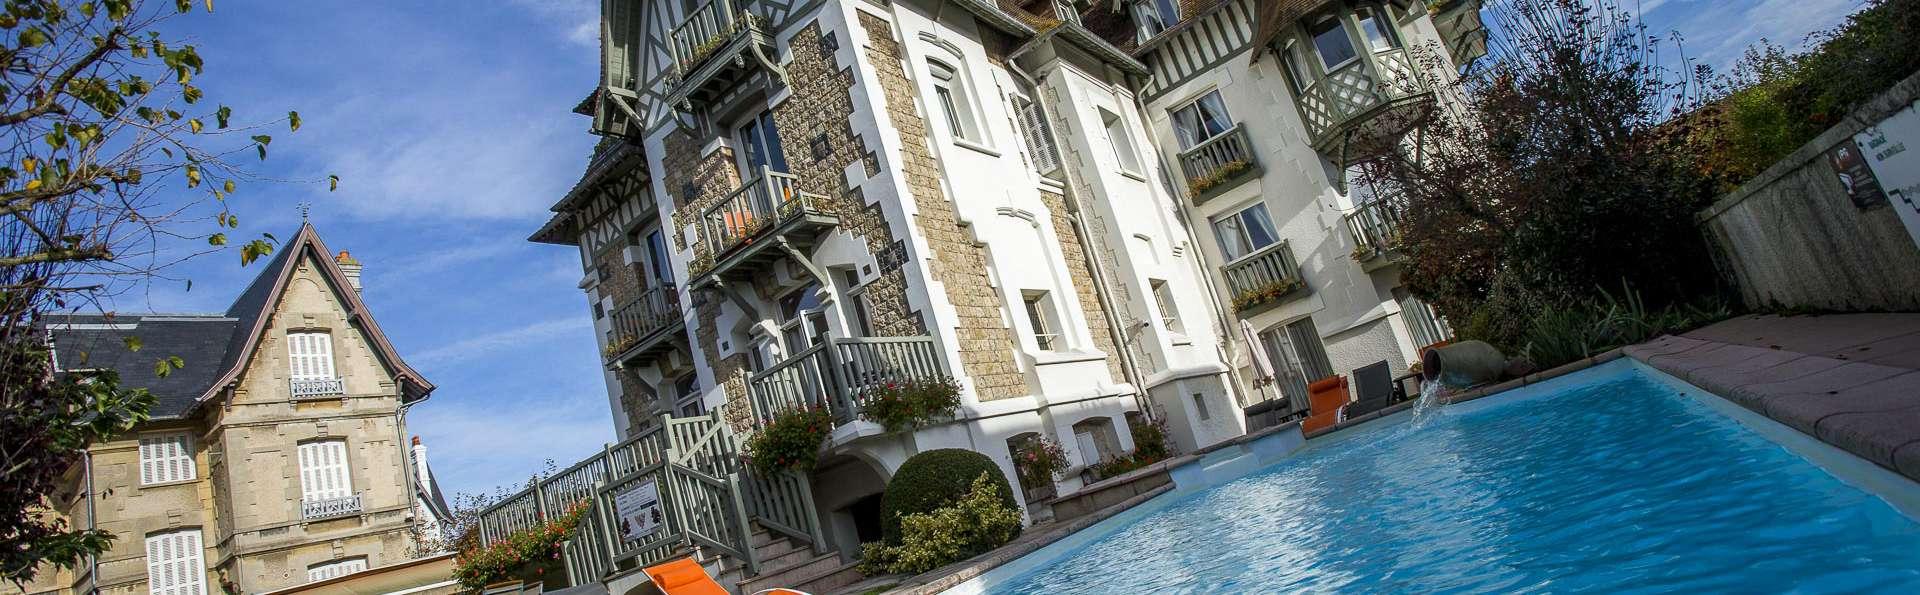 Hôtel Augeval - NEW_hotel_augeval_deauville_facade_augeval_piscine_03.jpg